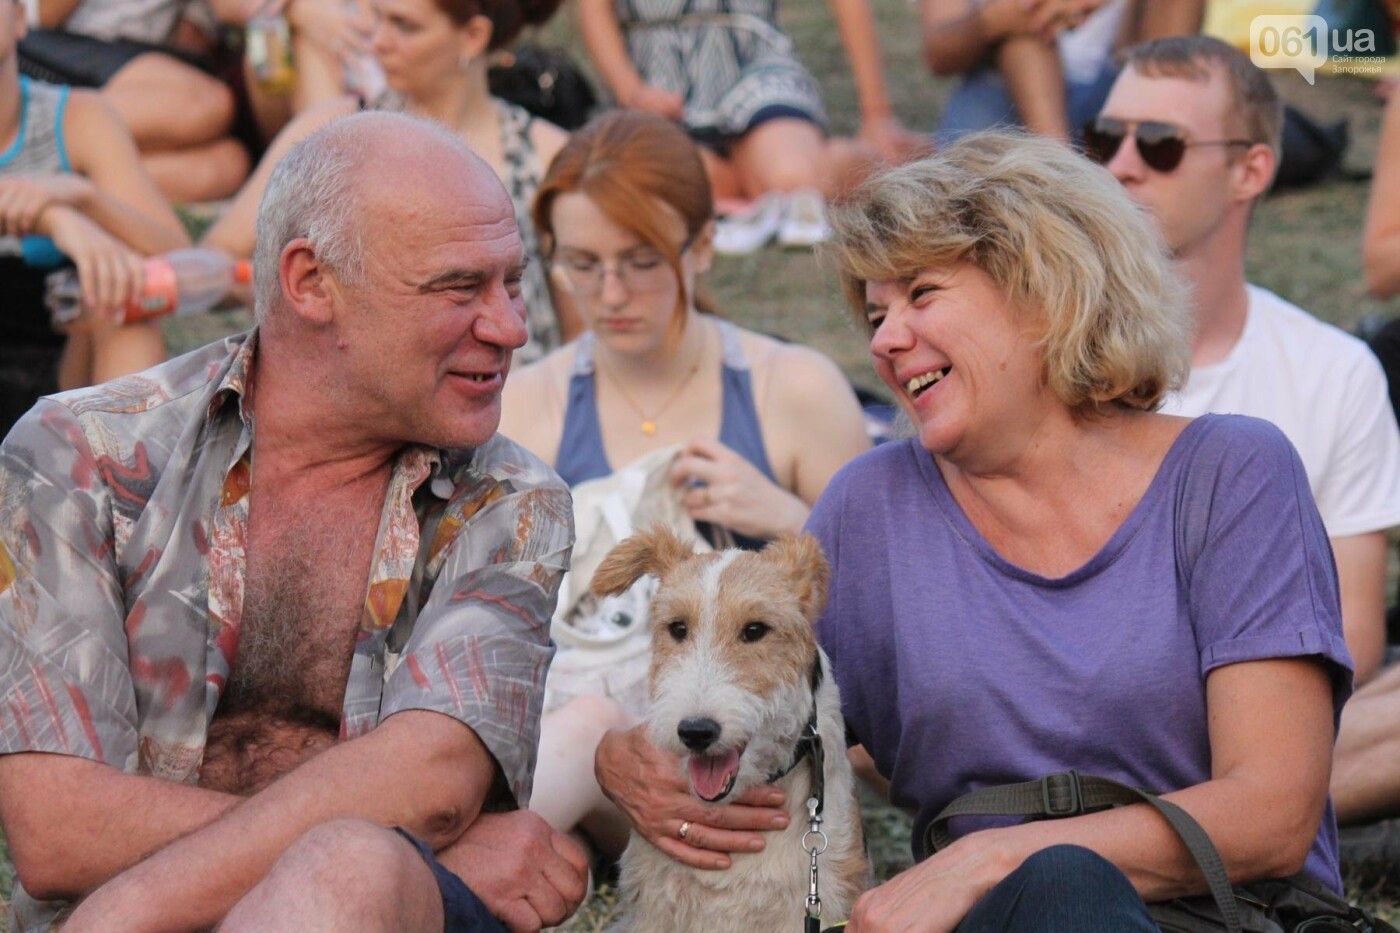 Найди себя: 50 портретов посетителей фестиваля Khortytsia Freedom, – ФОТОРЕПОРТАЖ, фото-41